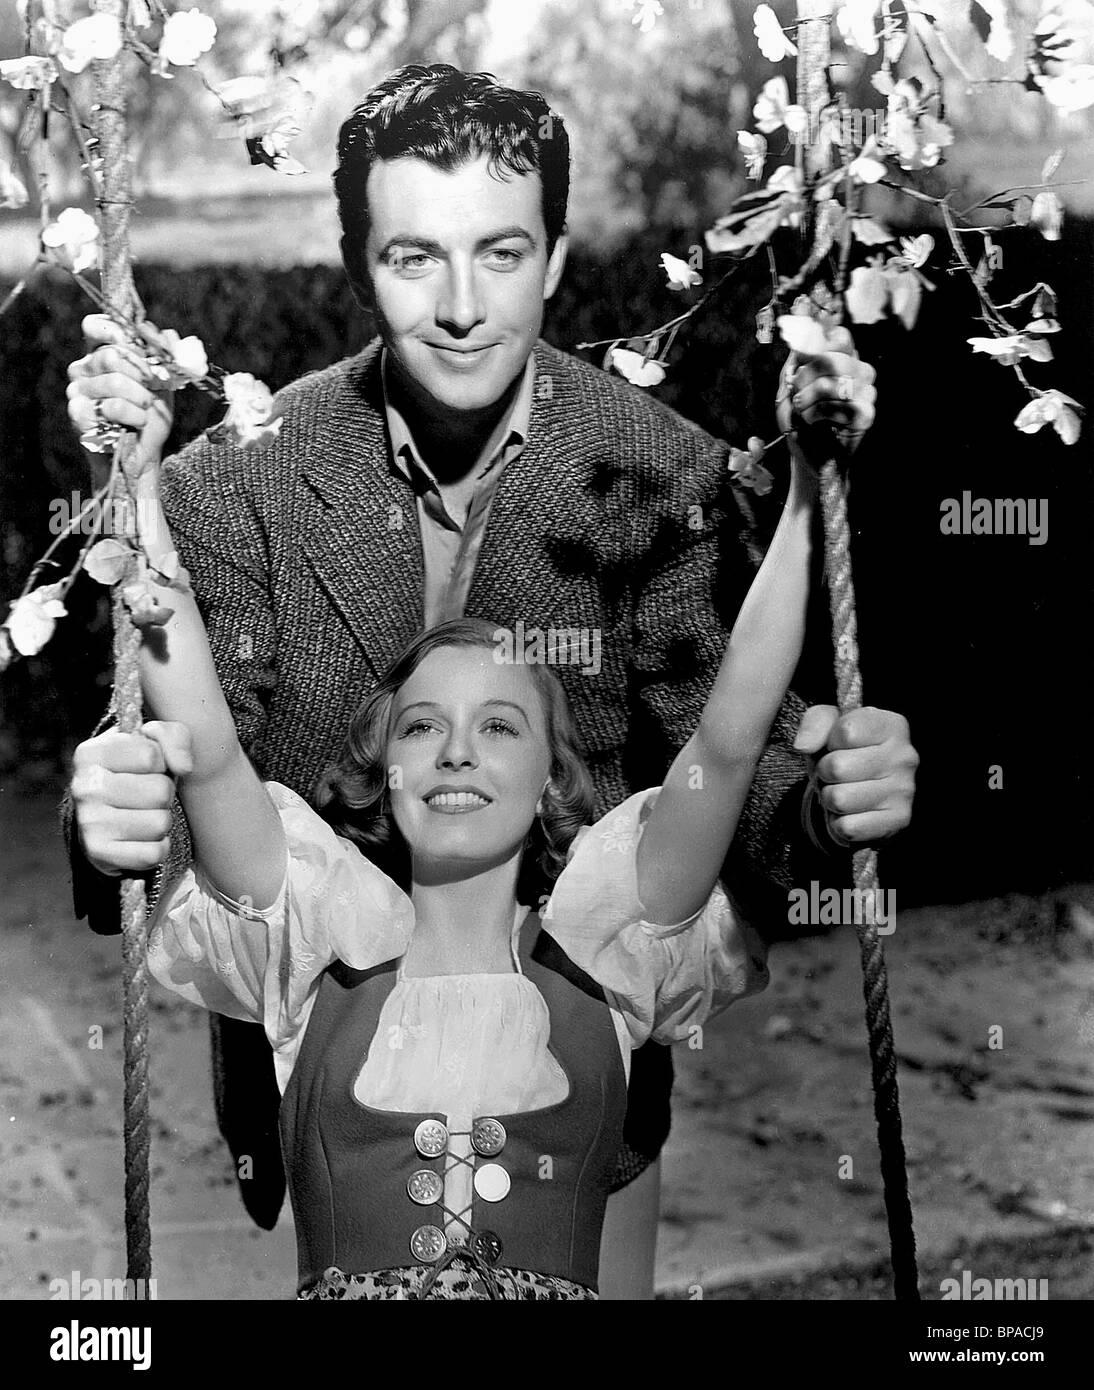 ROBERT TAYLOR & MARGARET SULLAVAN trois camarades (1938) Photo Stock